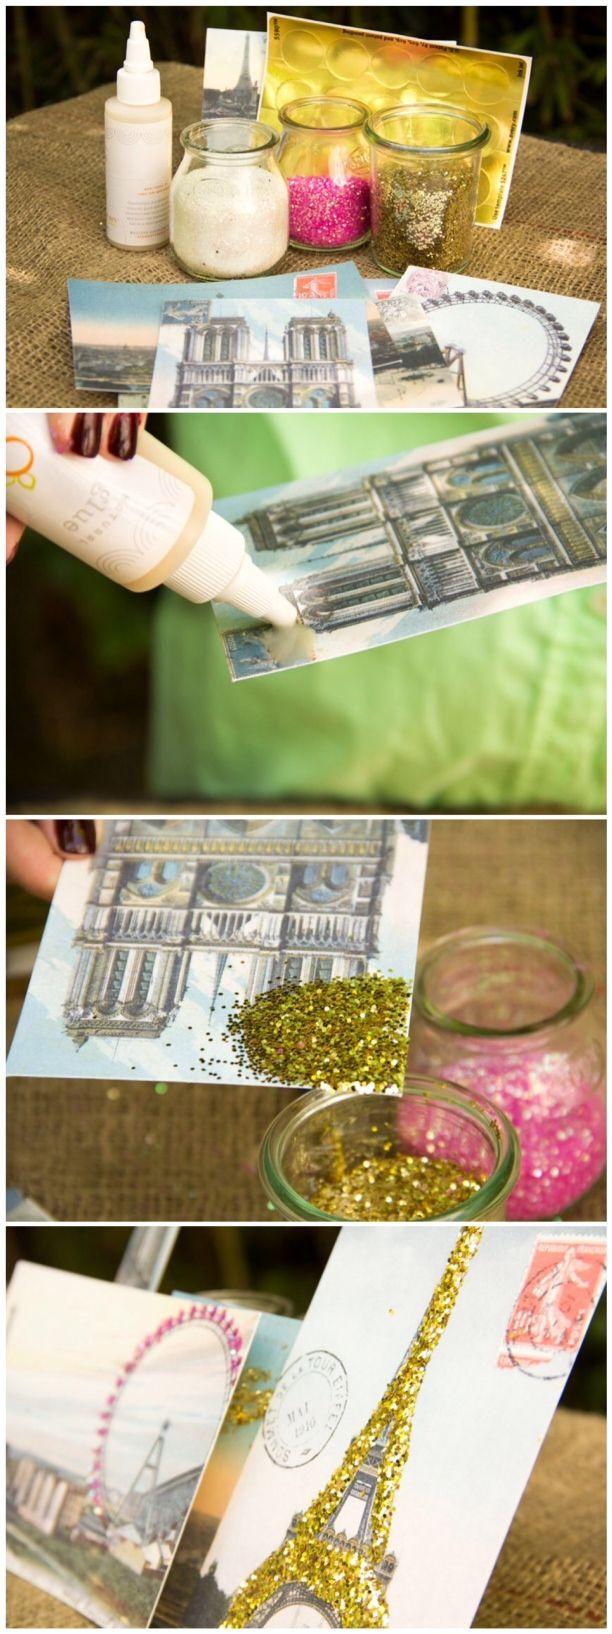 Vintage Postcard Art/ Moonfrye DIY/Glitter Crafts/ Kids Crafts/ Kids Art Projects